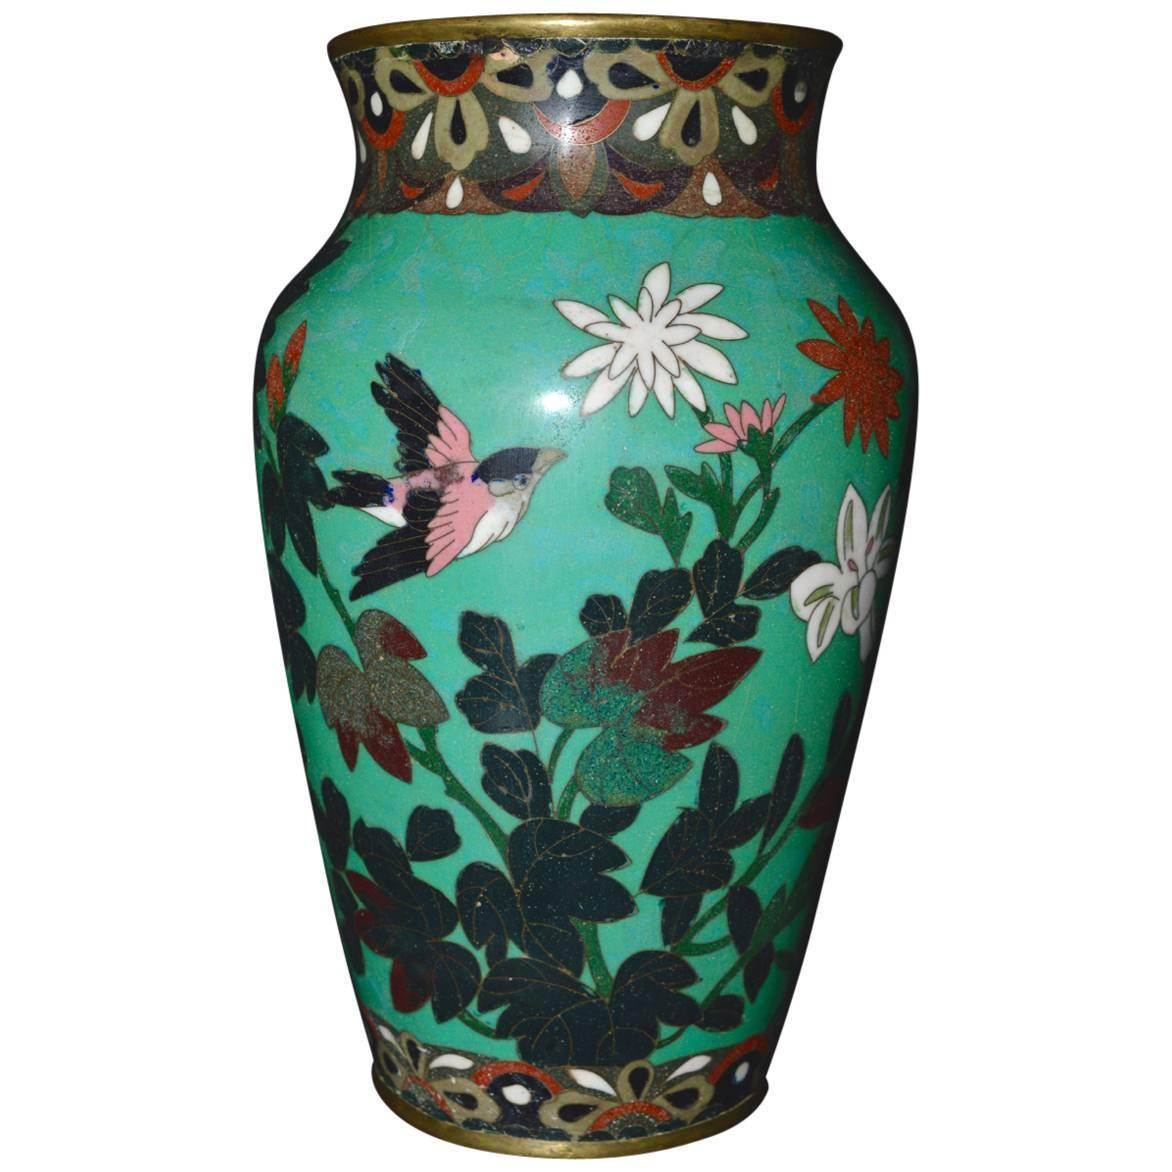 Japanese tsuiki jippo cloisonn vase atrributed to ogasawara shuzo antique meiji period japanese green cloisonn vase reviewsmspy